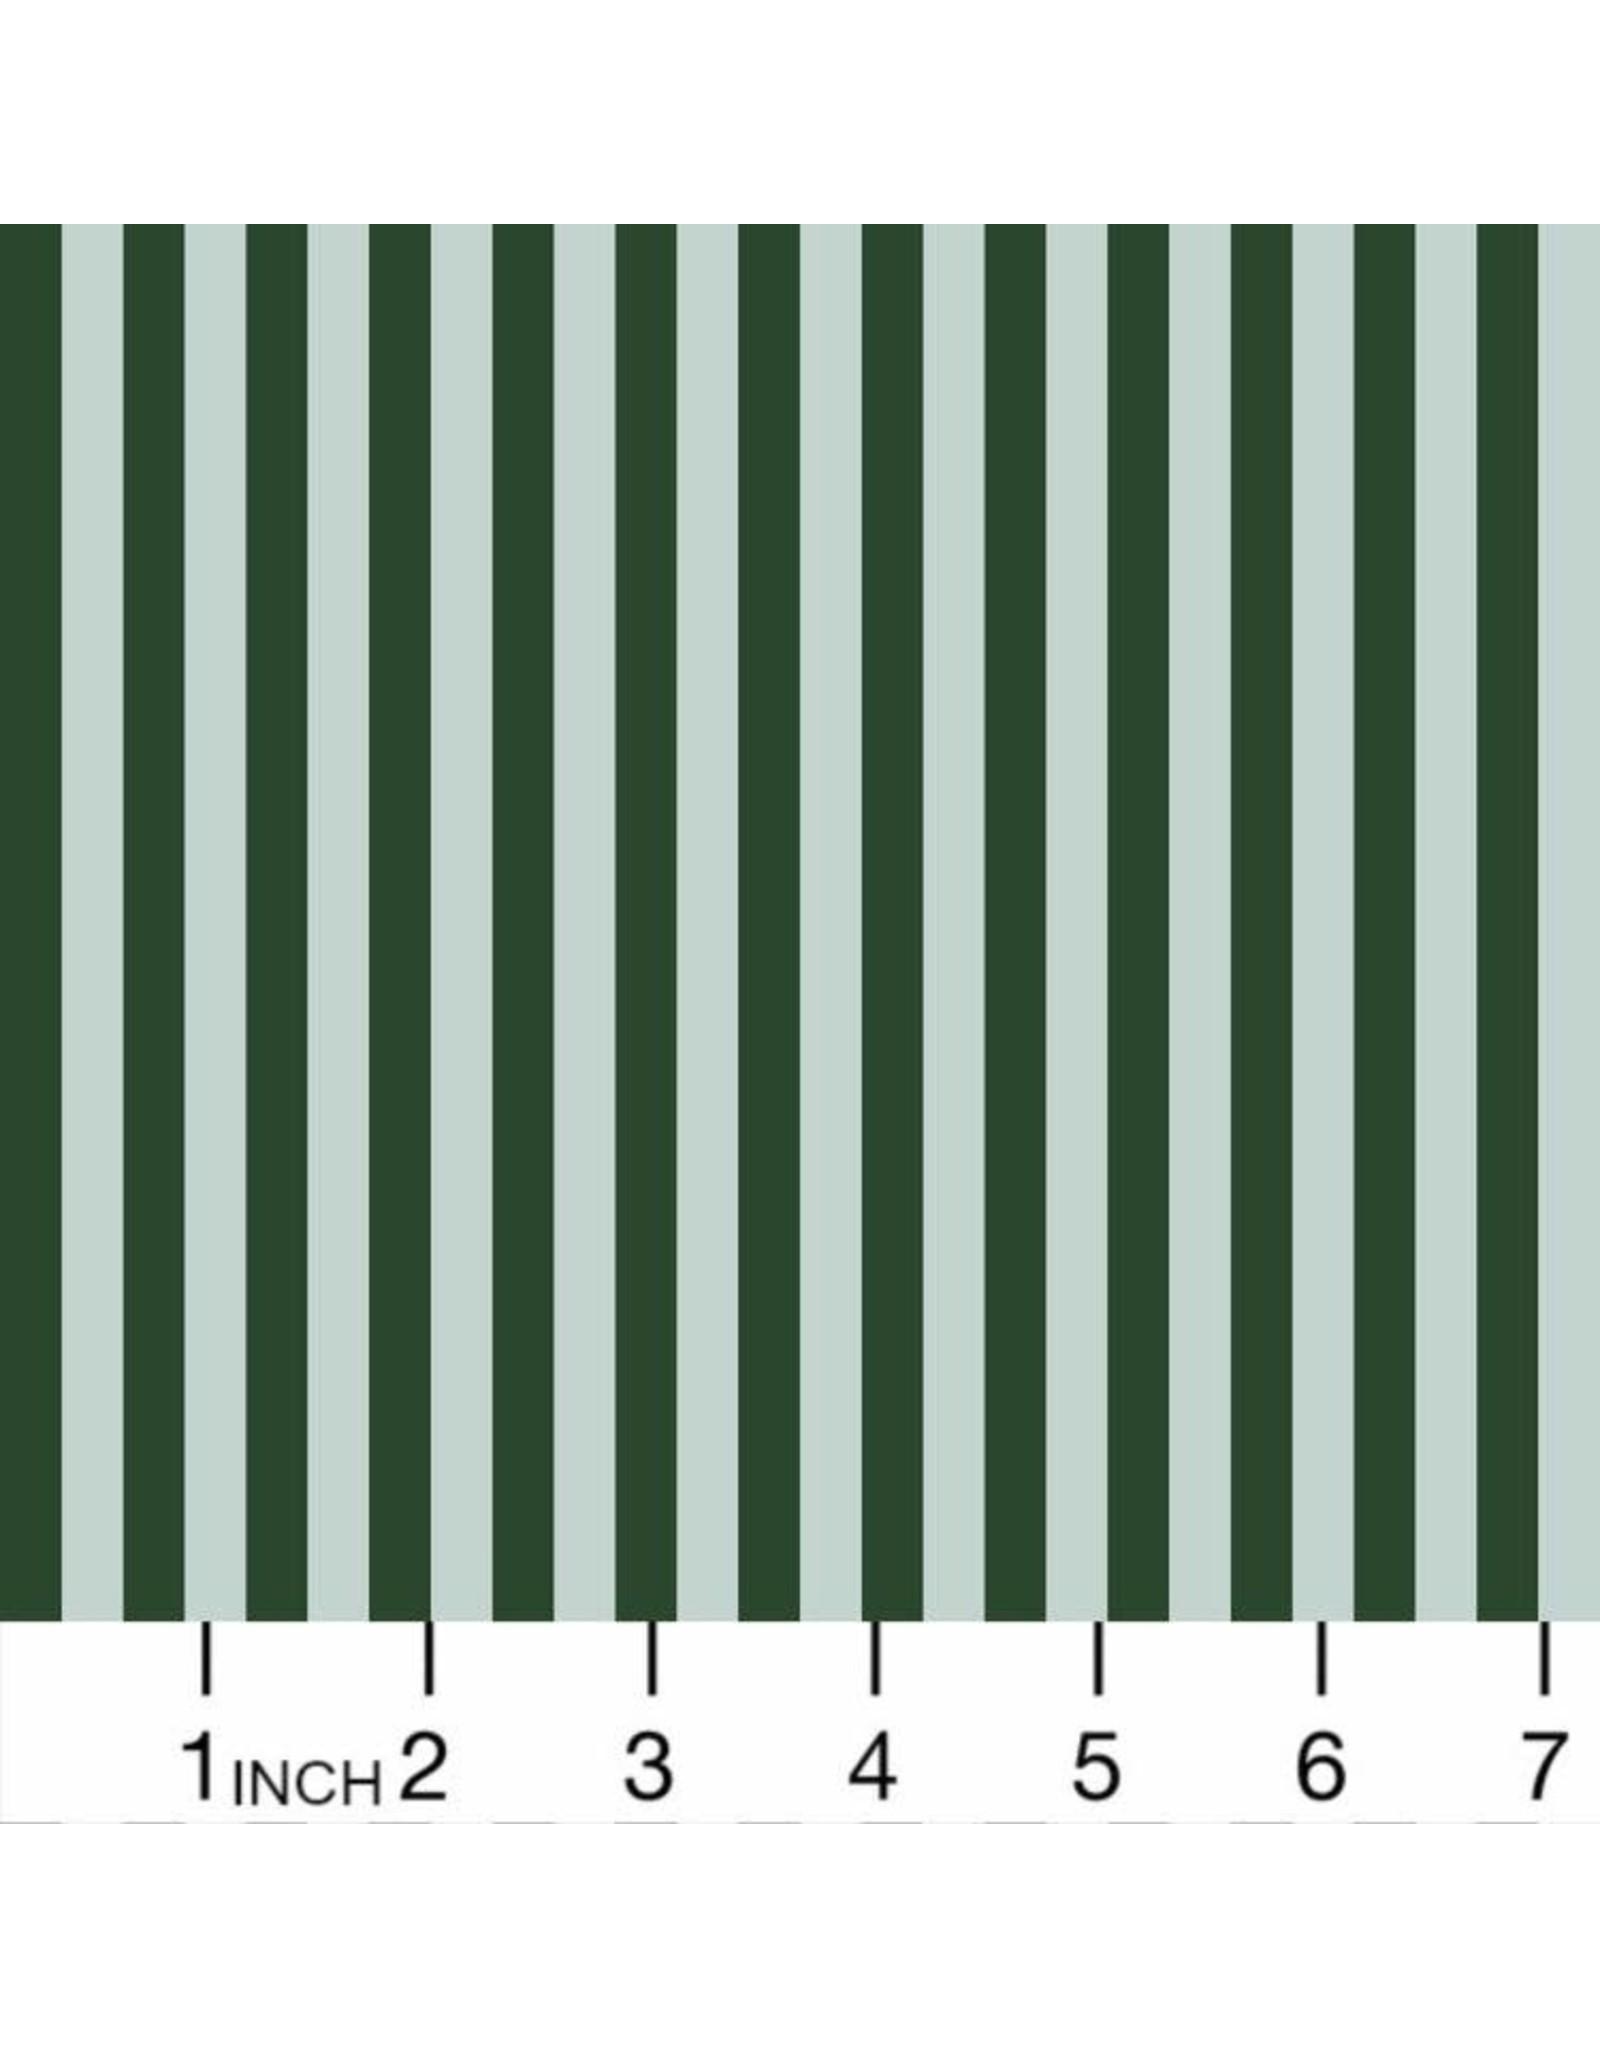 "Rifle Paper Co. Primavera, Cabana Stripe in Mint, Fabric Half-Yards RP309-MI1 (ONE 17"" CUT REMAINING)"